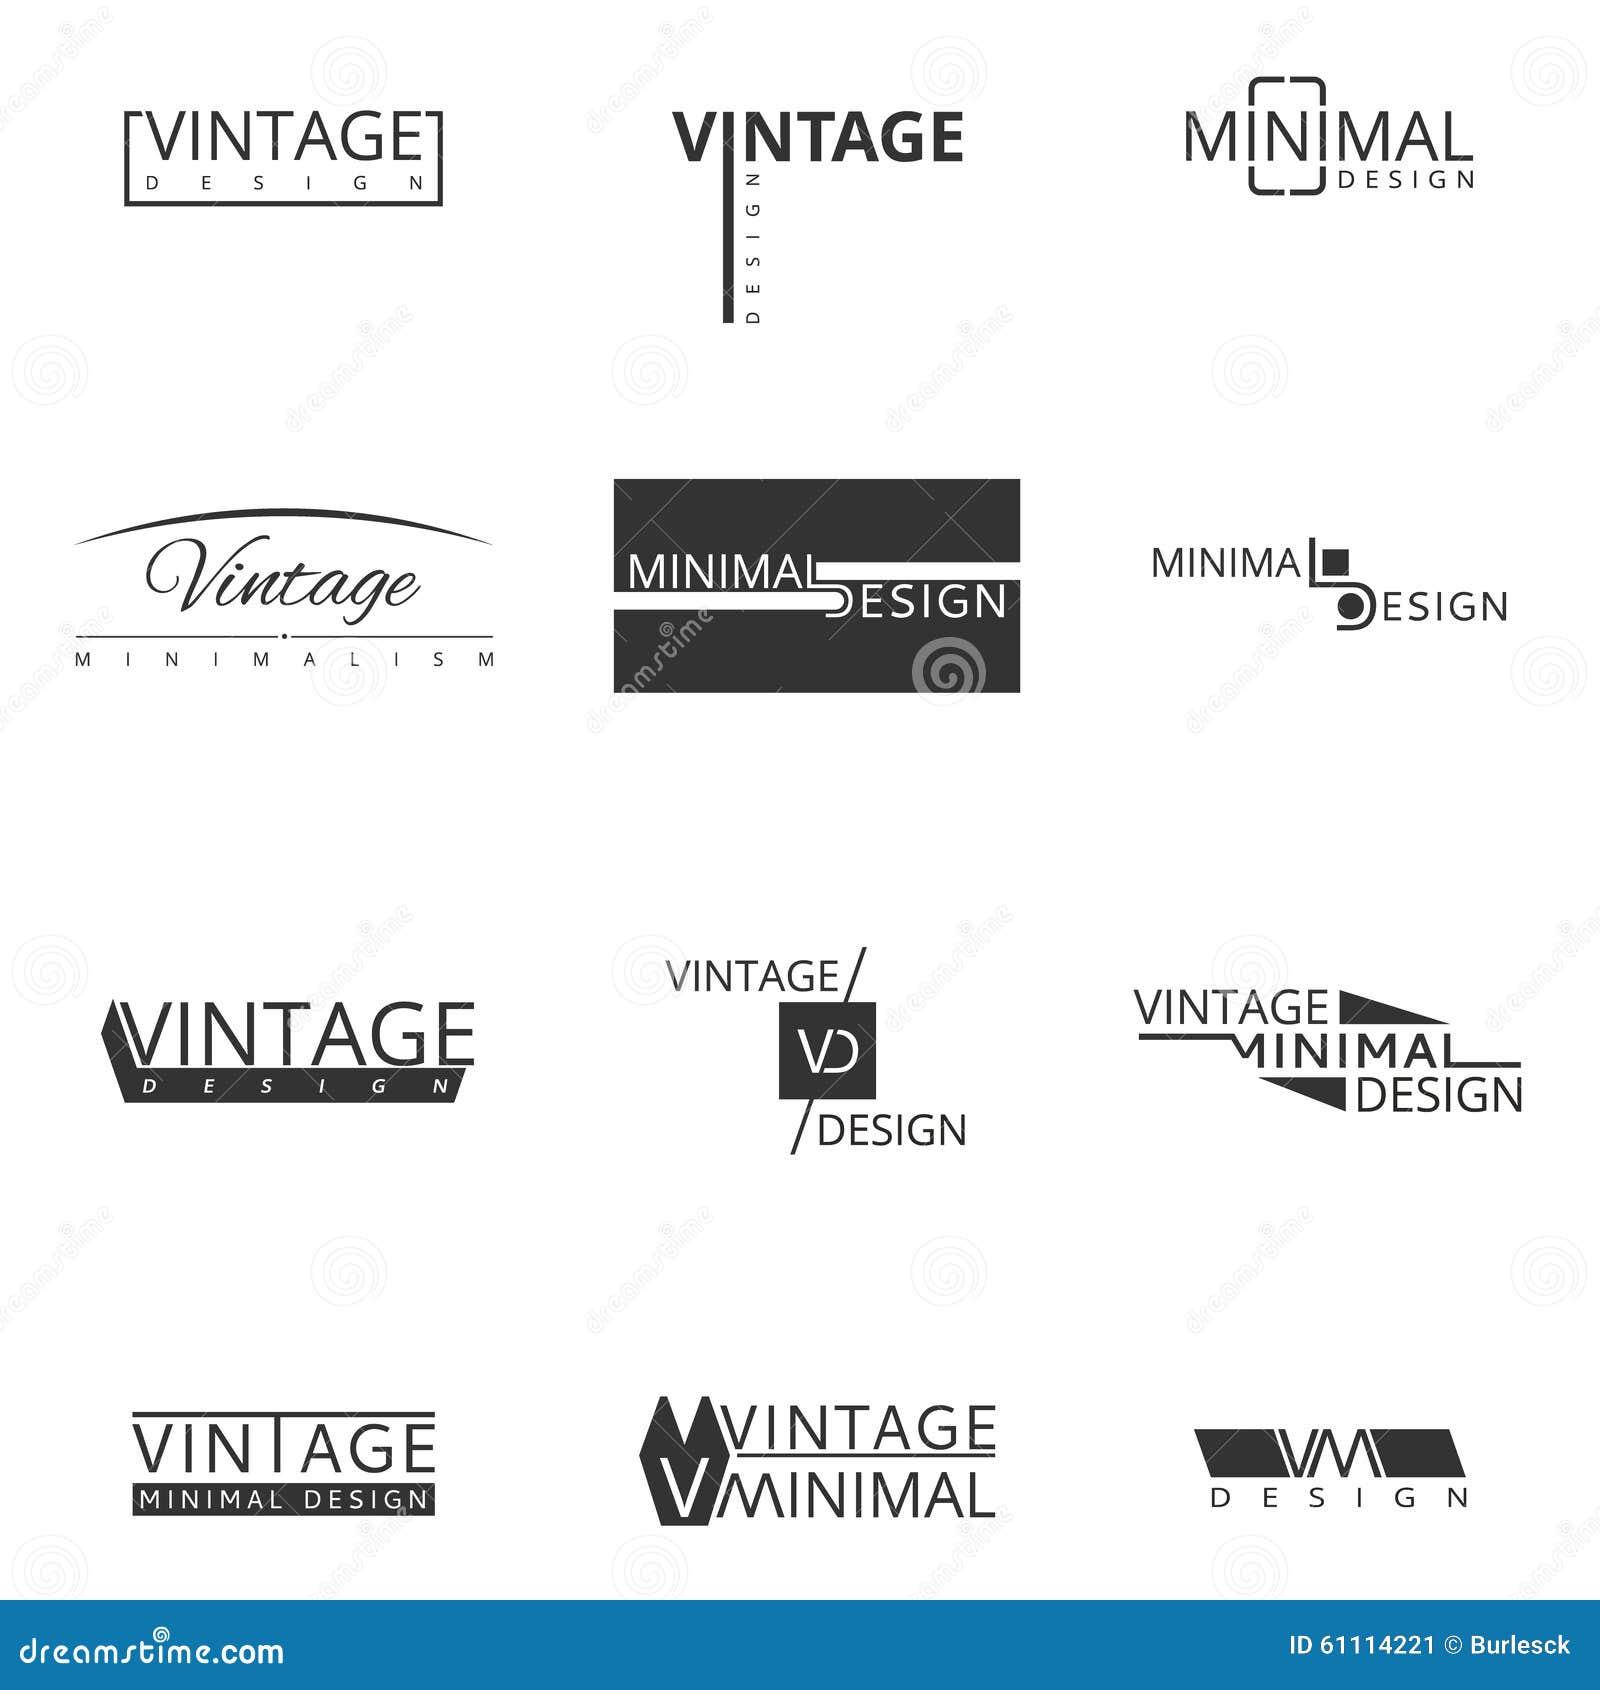 Minimal modern logo design for brand stock vector image Branding and logo design companies